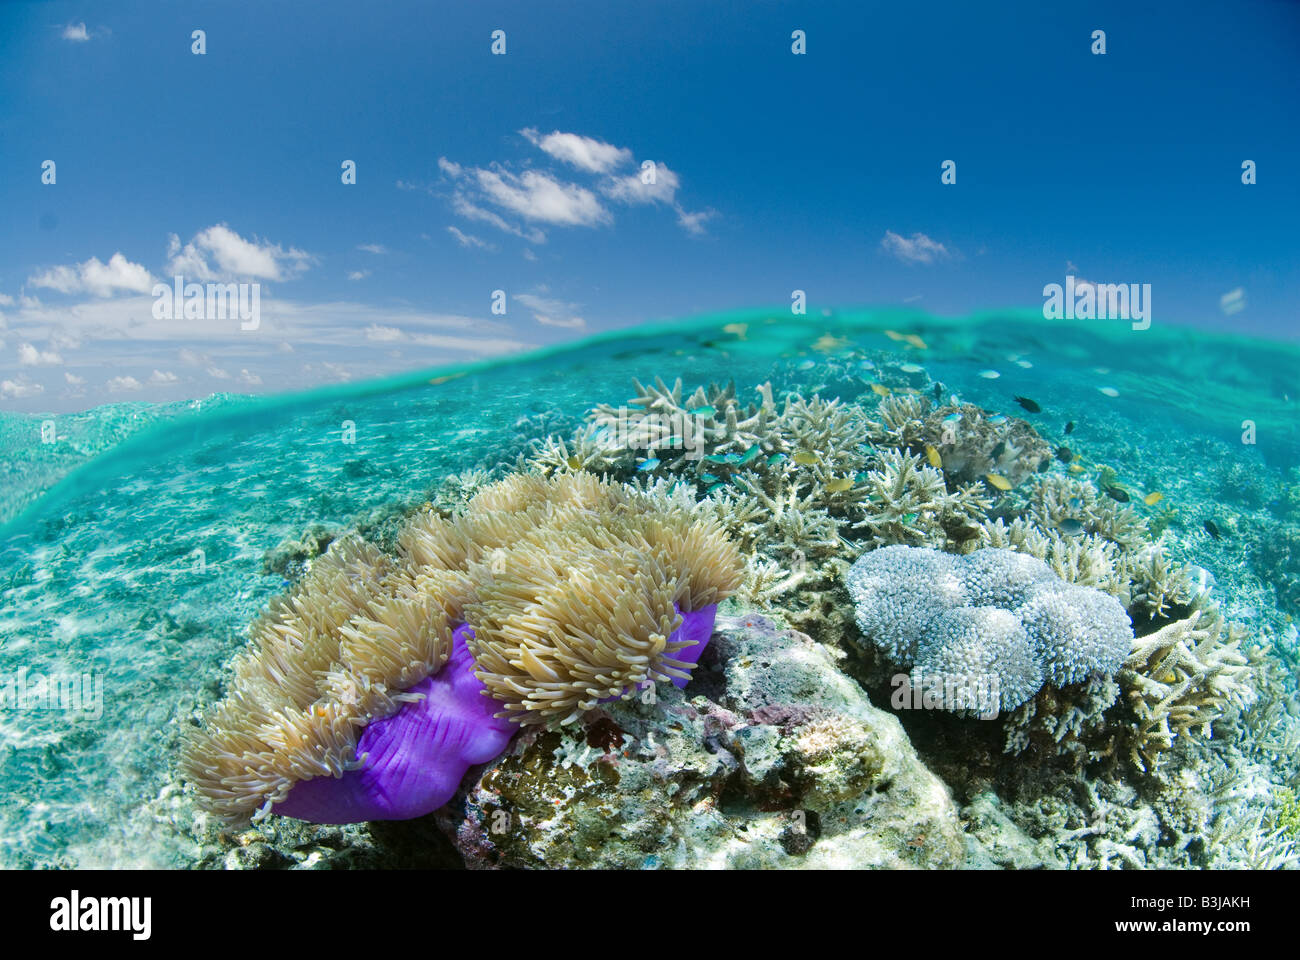 Over/under shot superficial de coloridos arrecifes de coral. Foto de stock